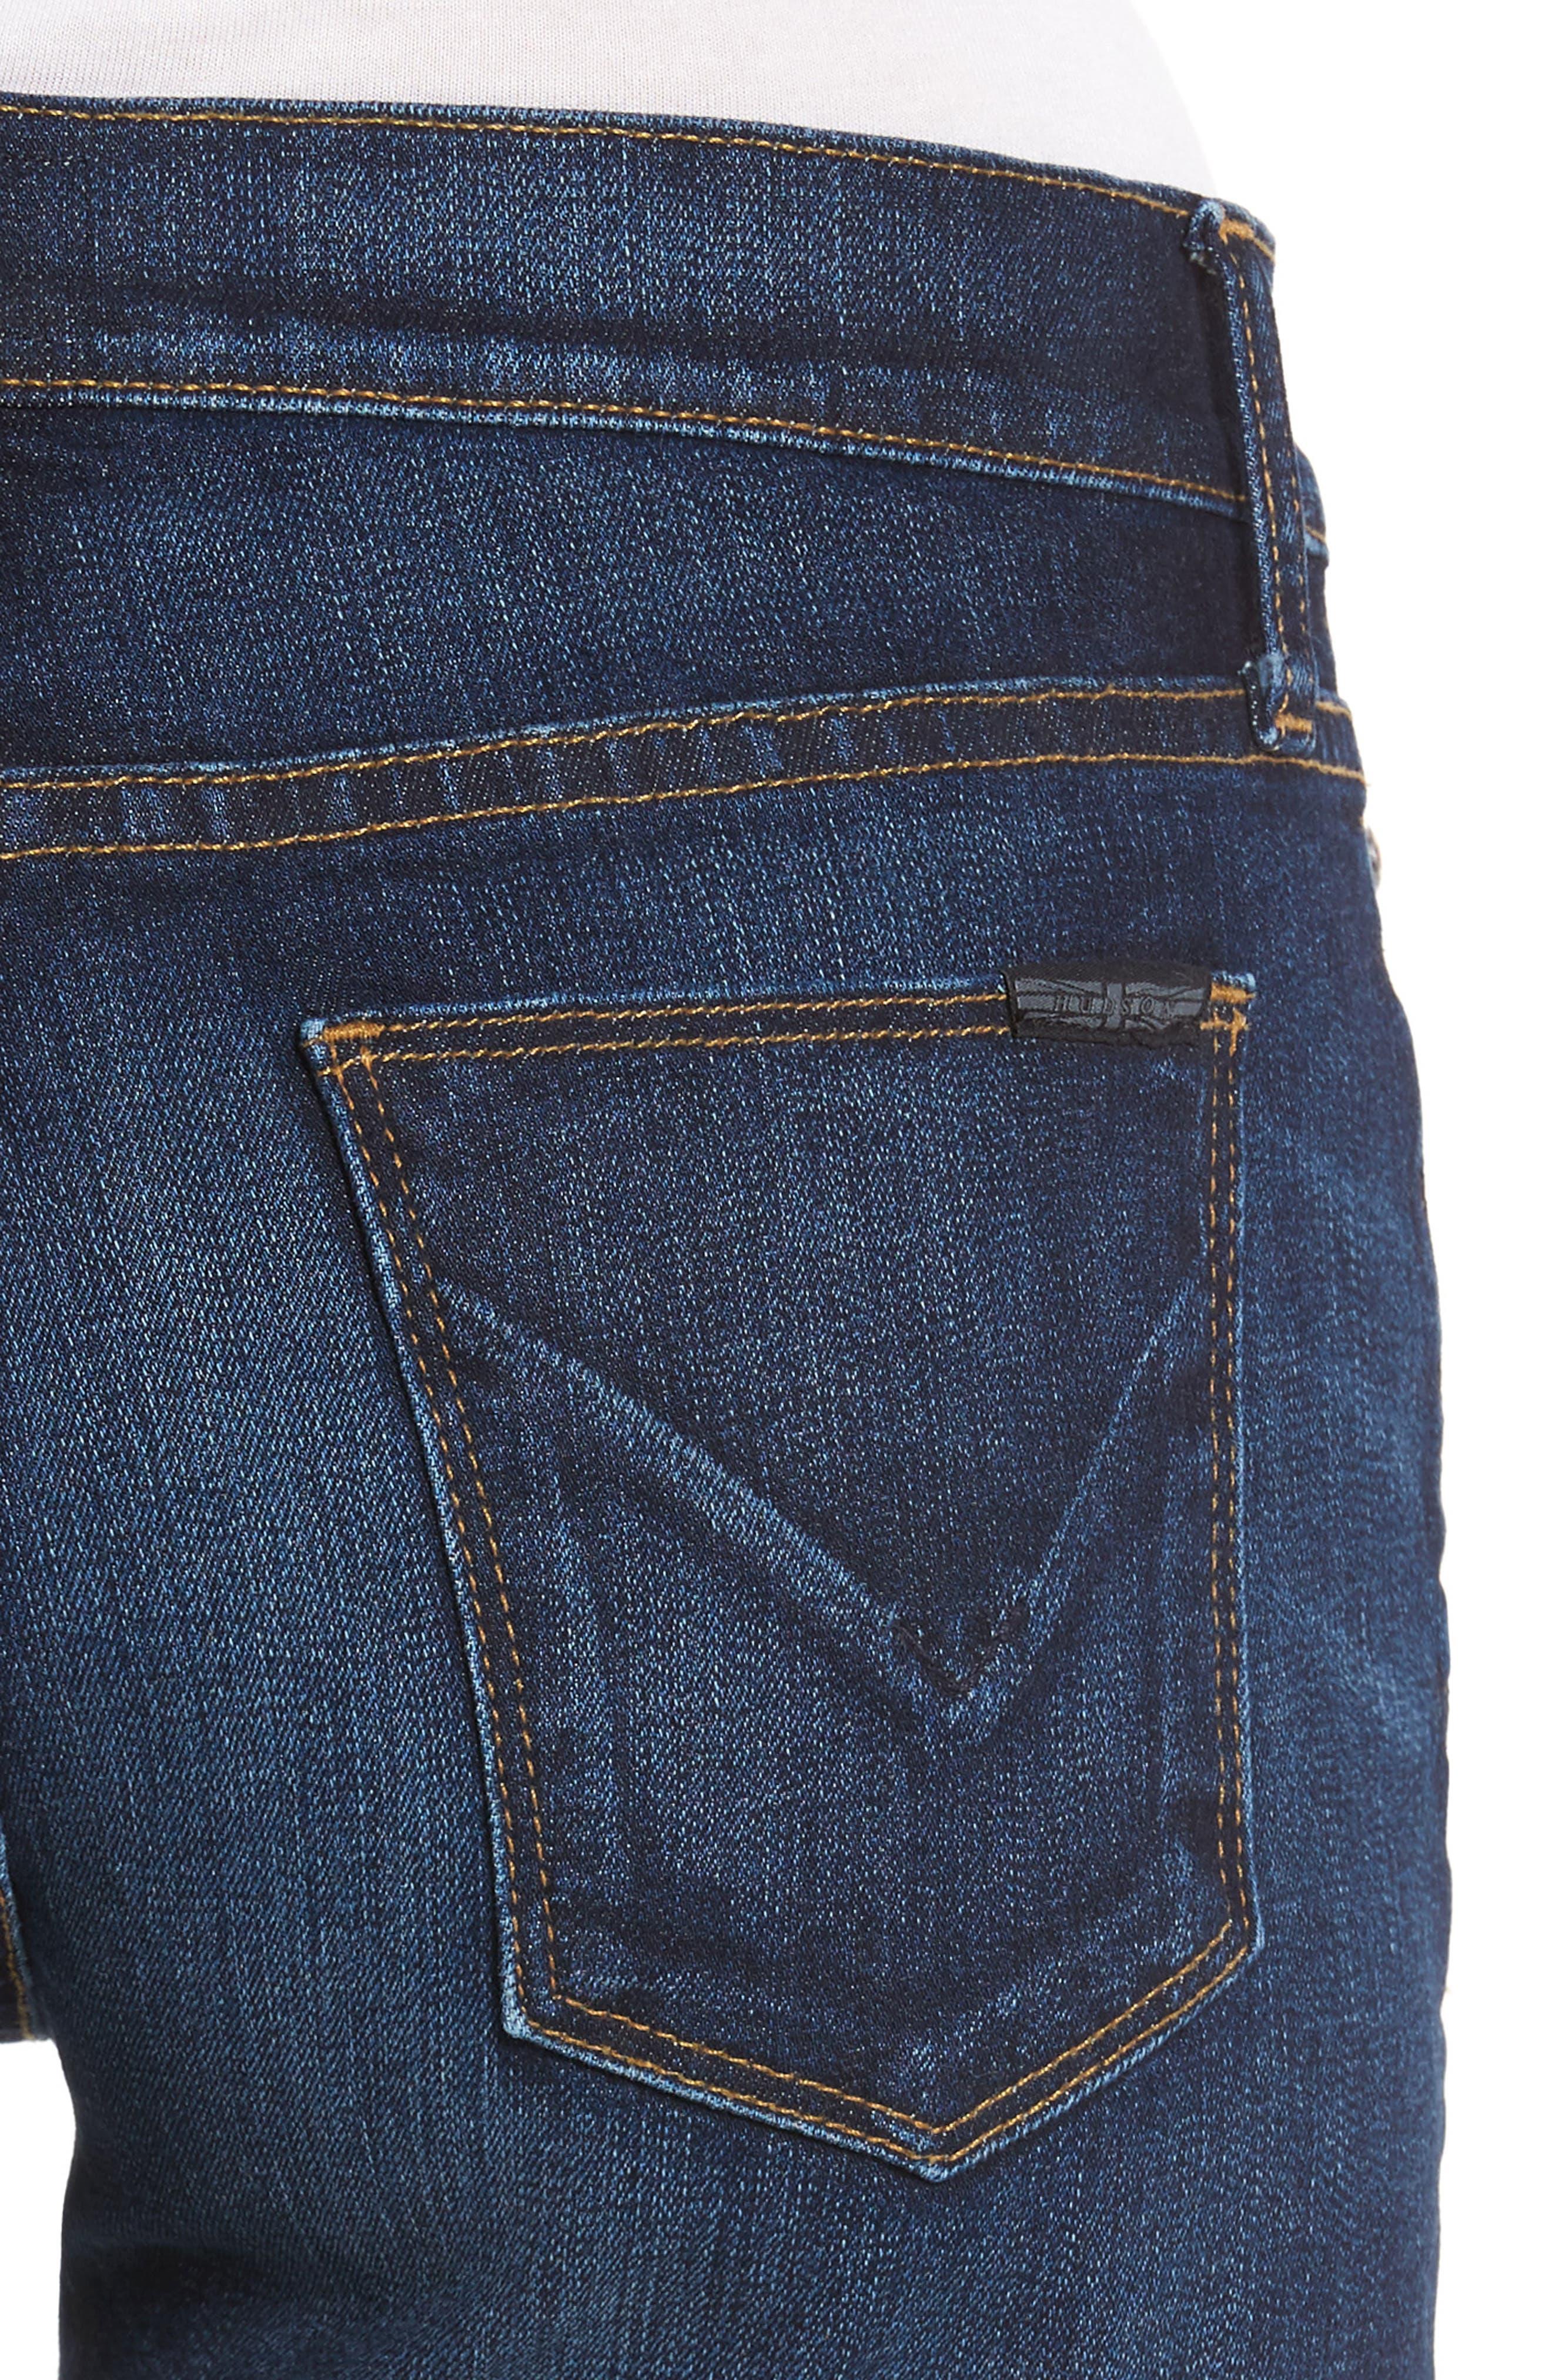 Asha Denim Shorts,                             Alternate thumbnail 4, color,                             401